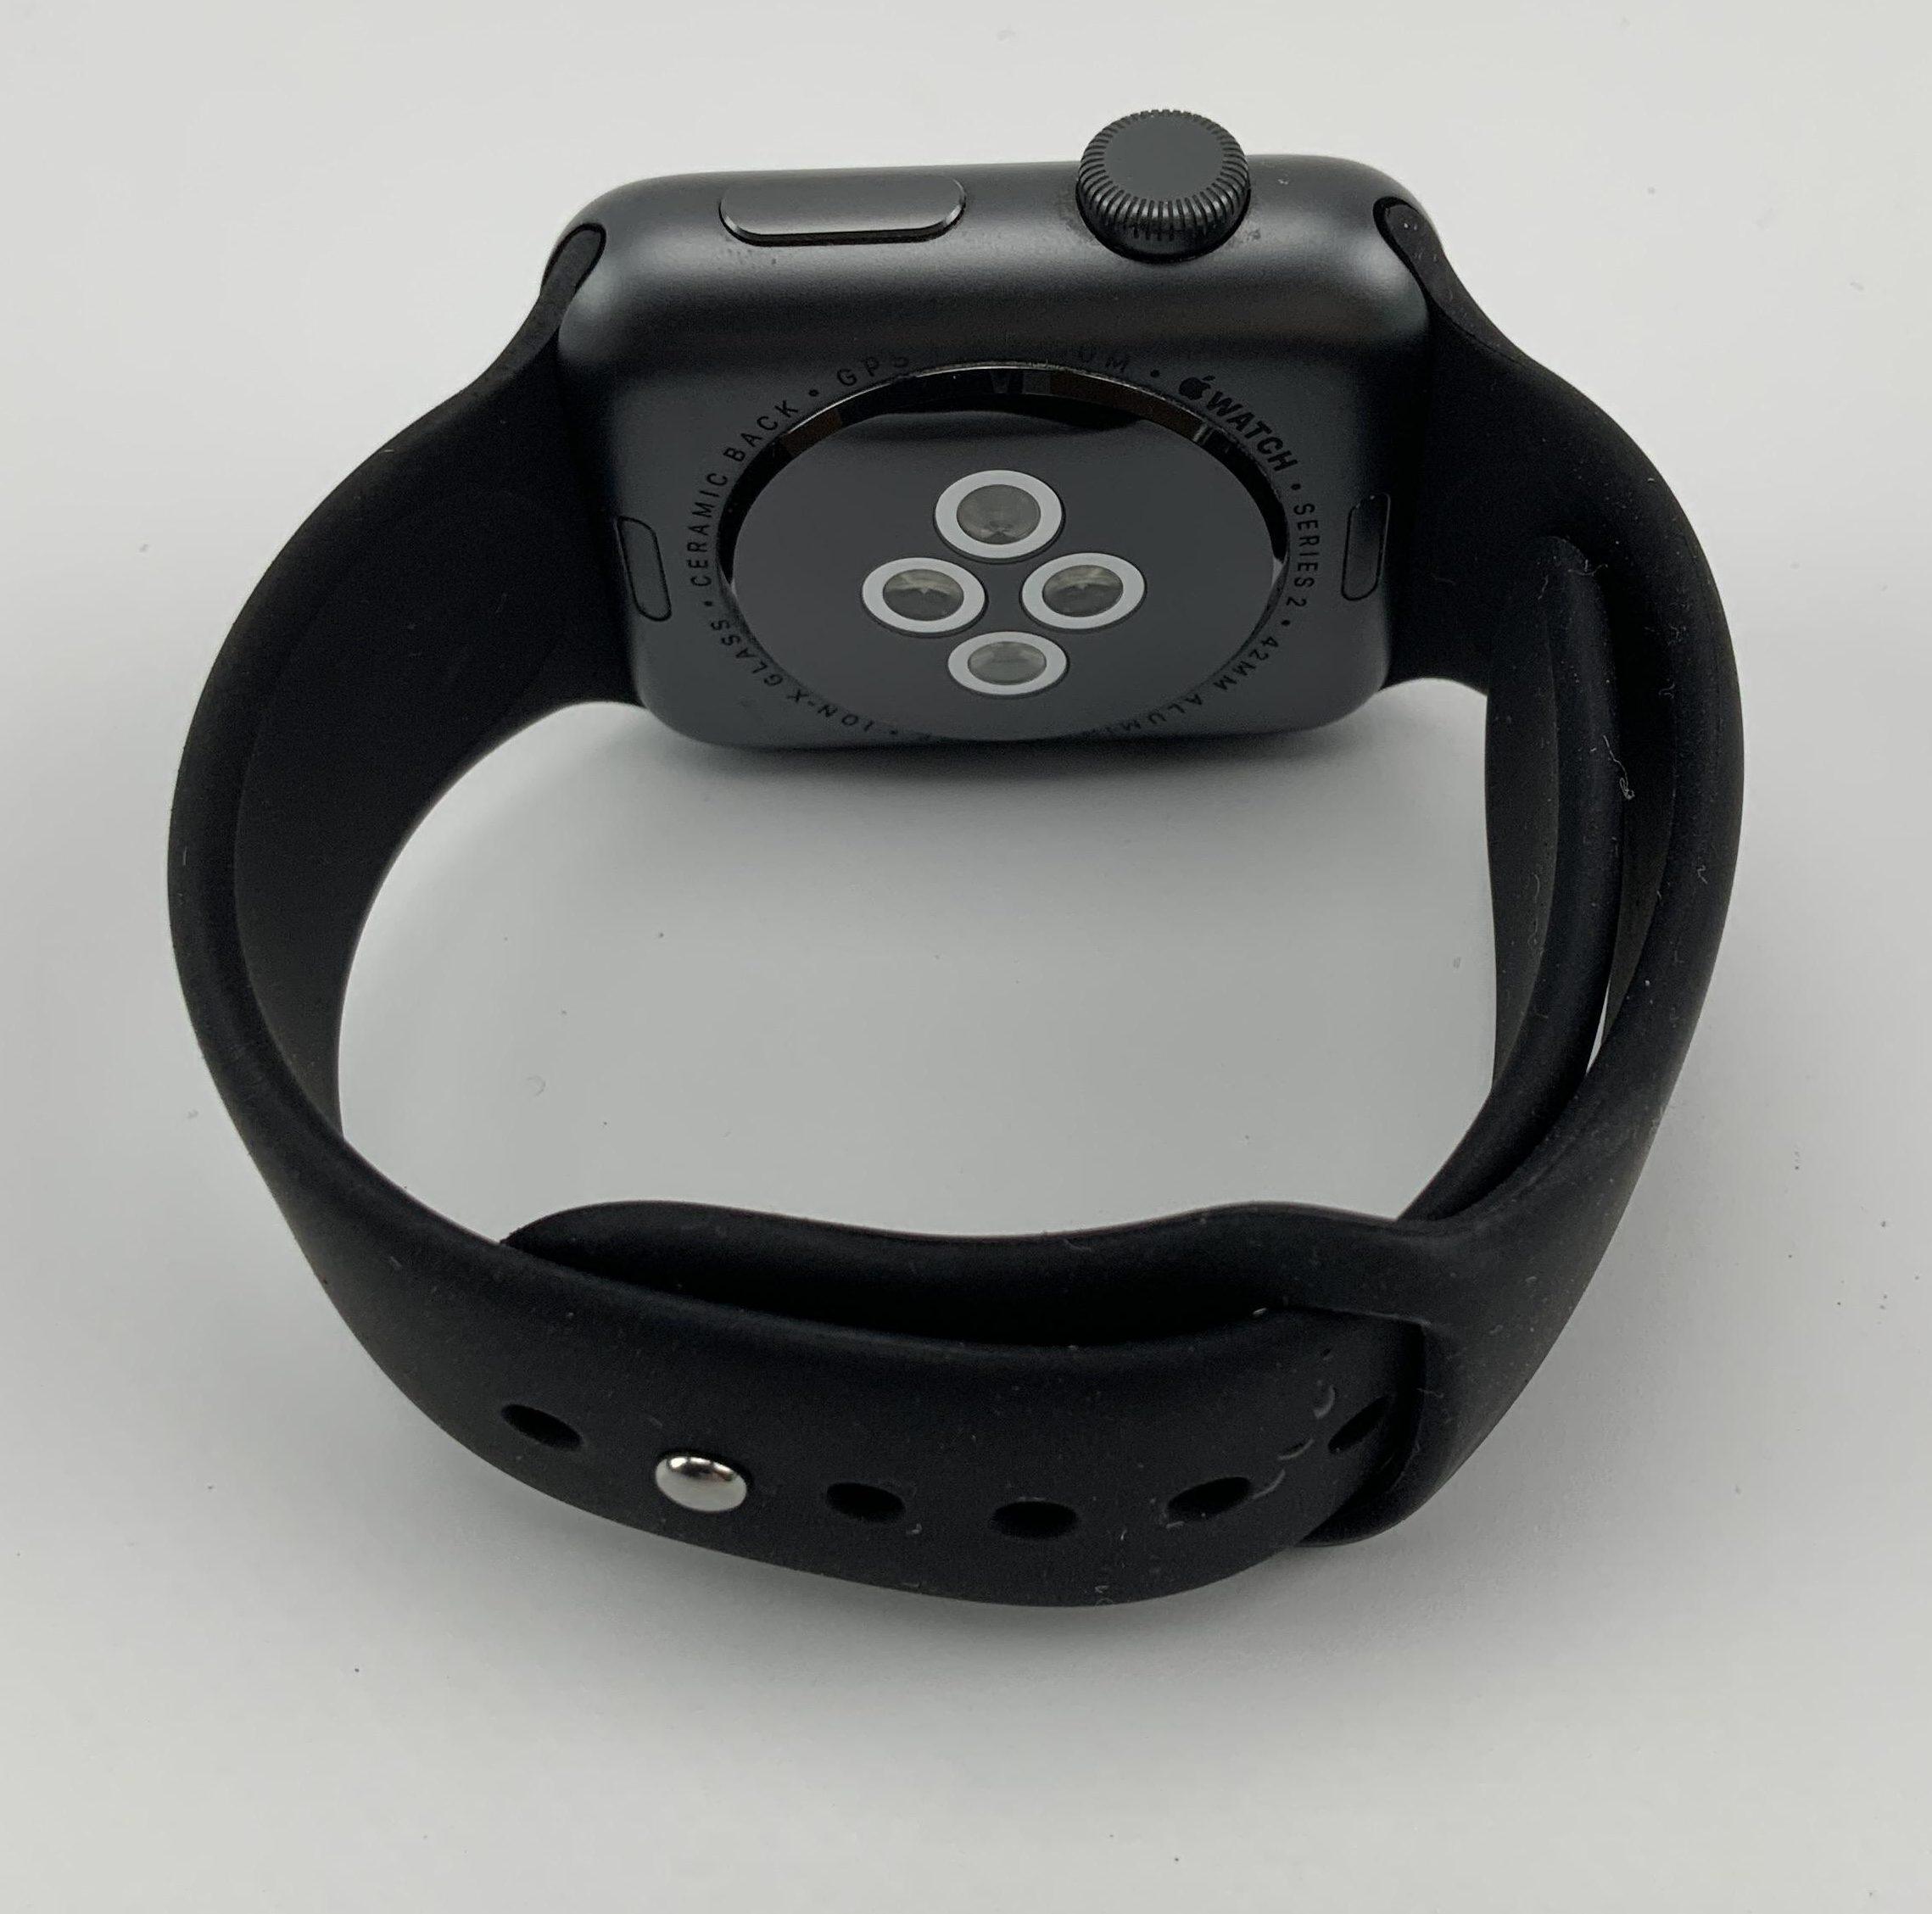 Watch Series 2 Aluminum (42mm), Space Gray, Black Sport Band, obraz 2